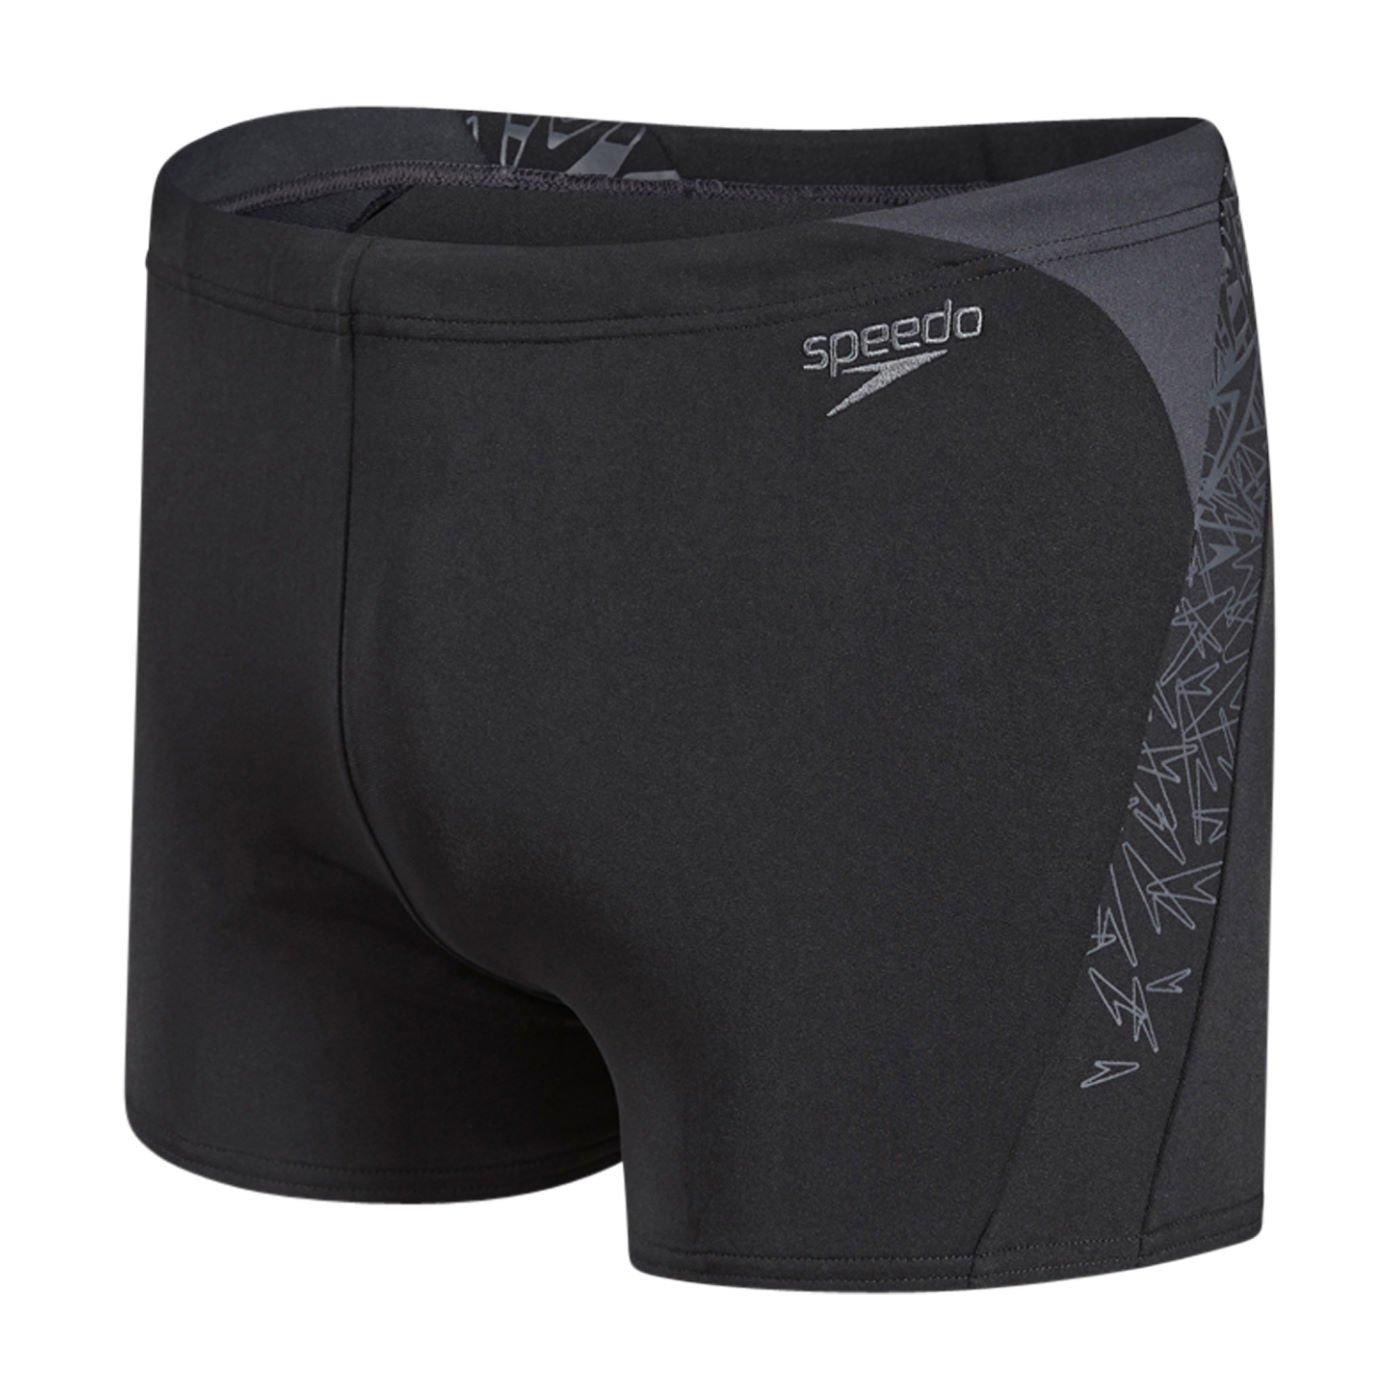 TALLA 28. Speedo Boom Splice Aquashort Pantalón Corto, Hombre